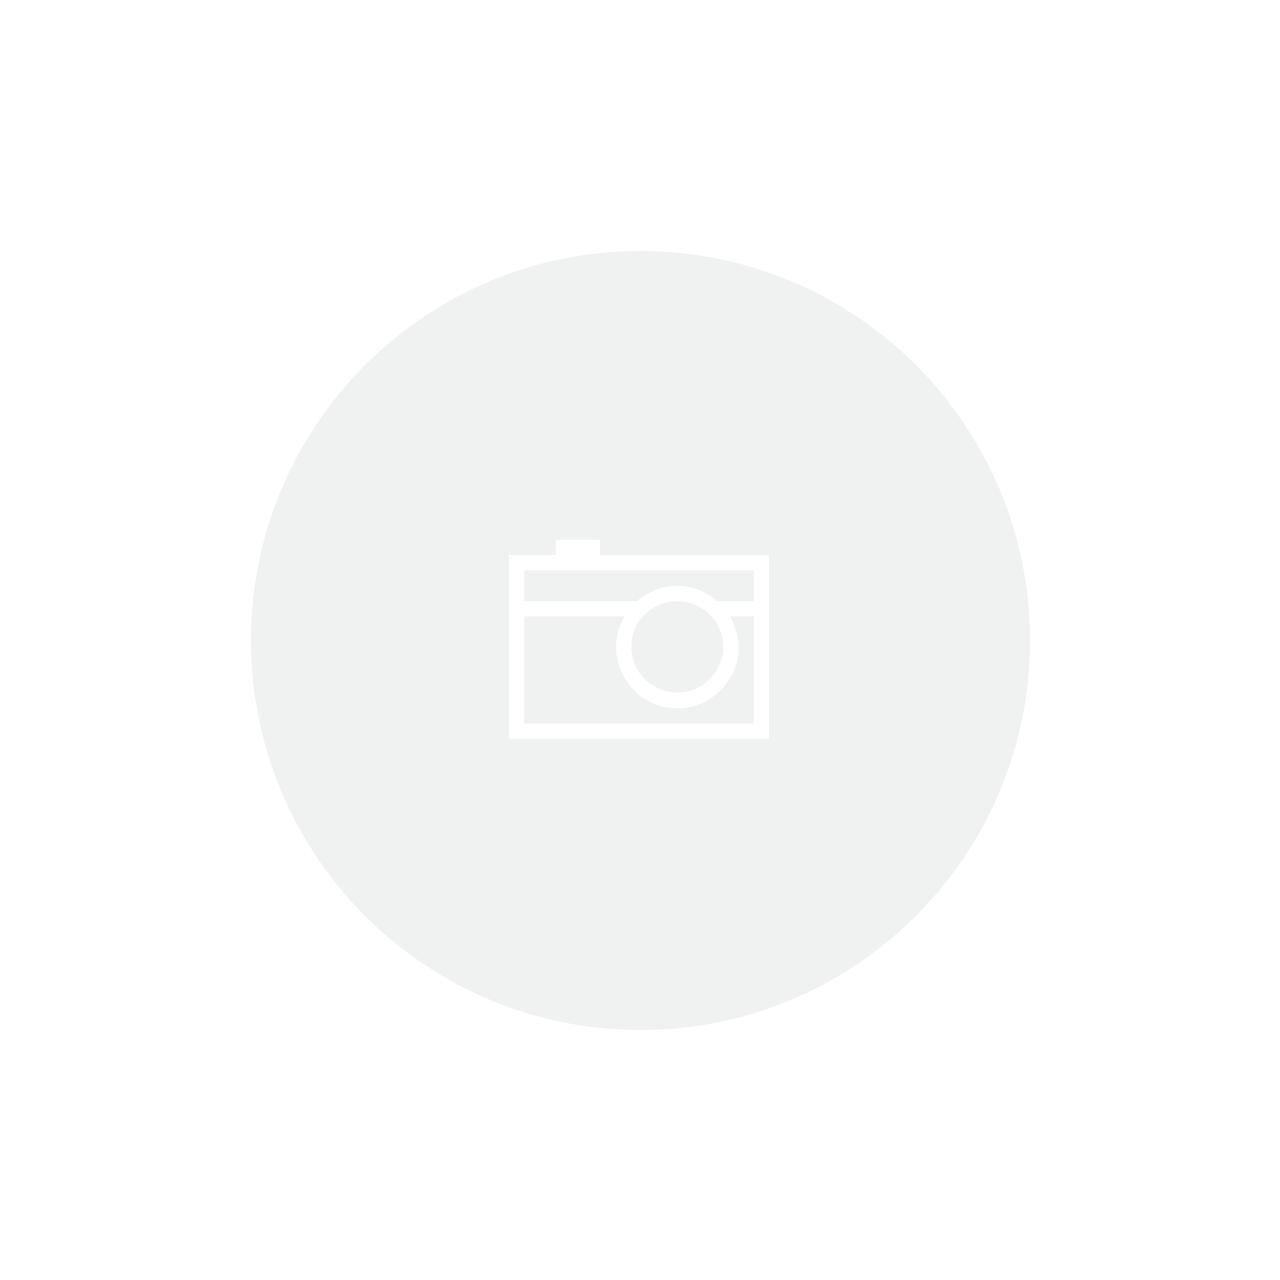 Blusa Onça Cardada 115IF17 Est 005